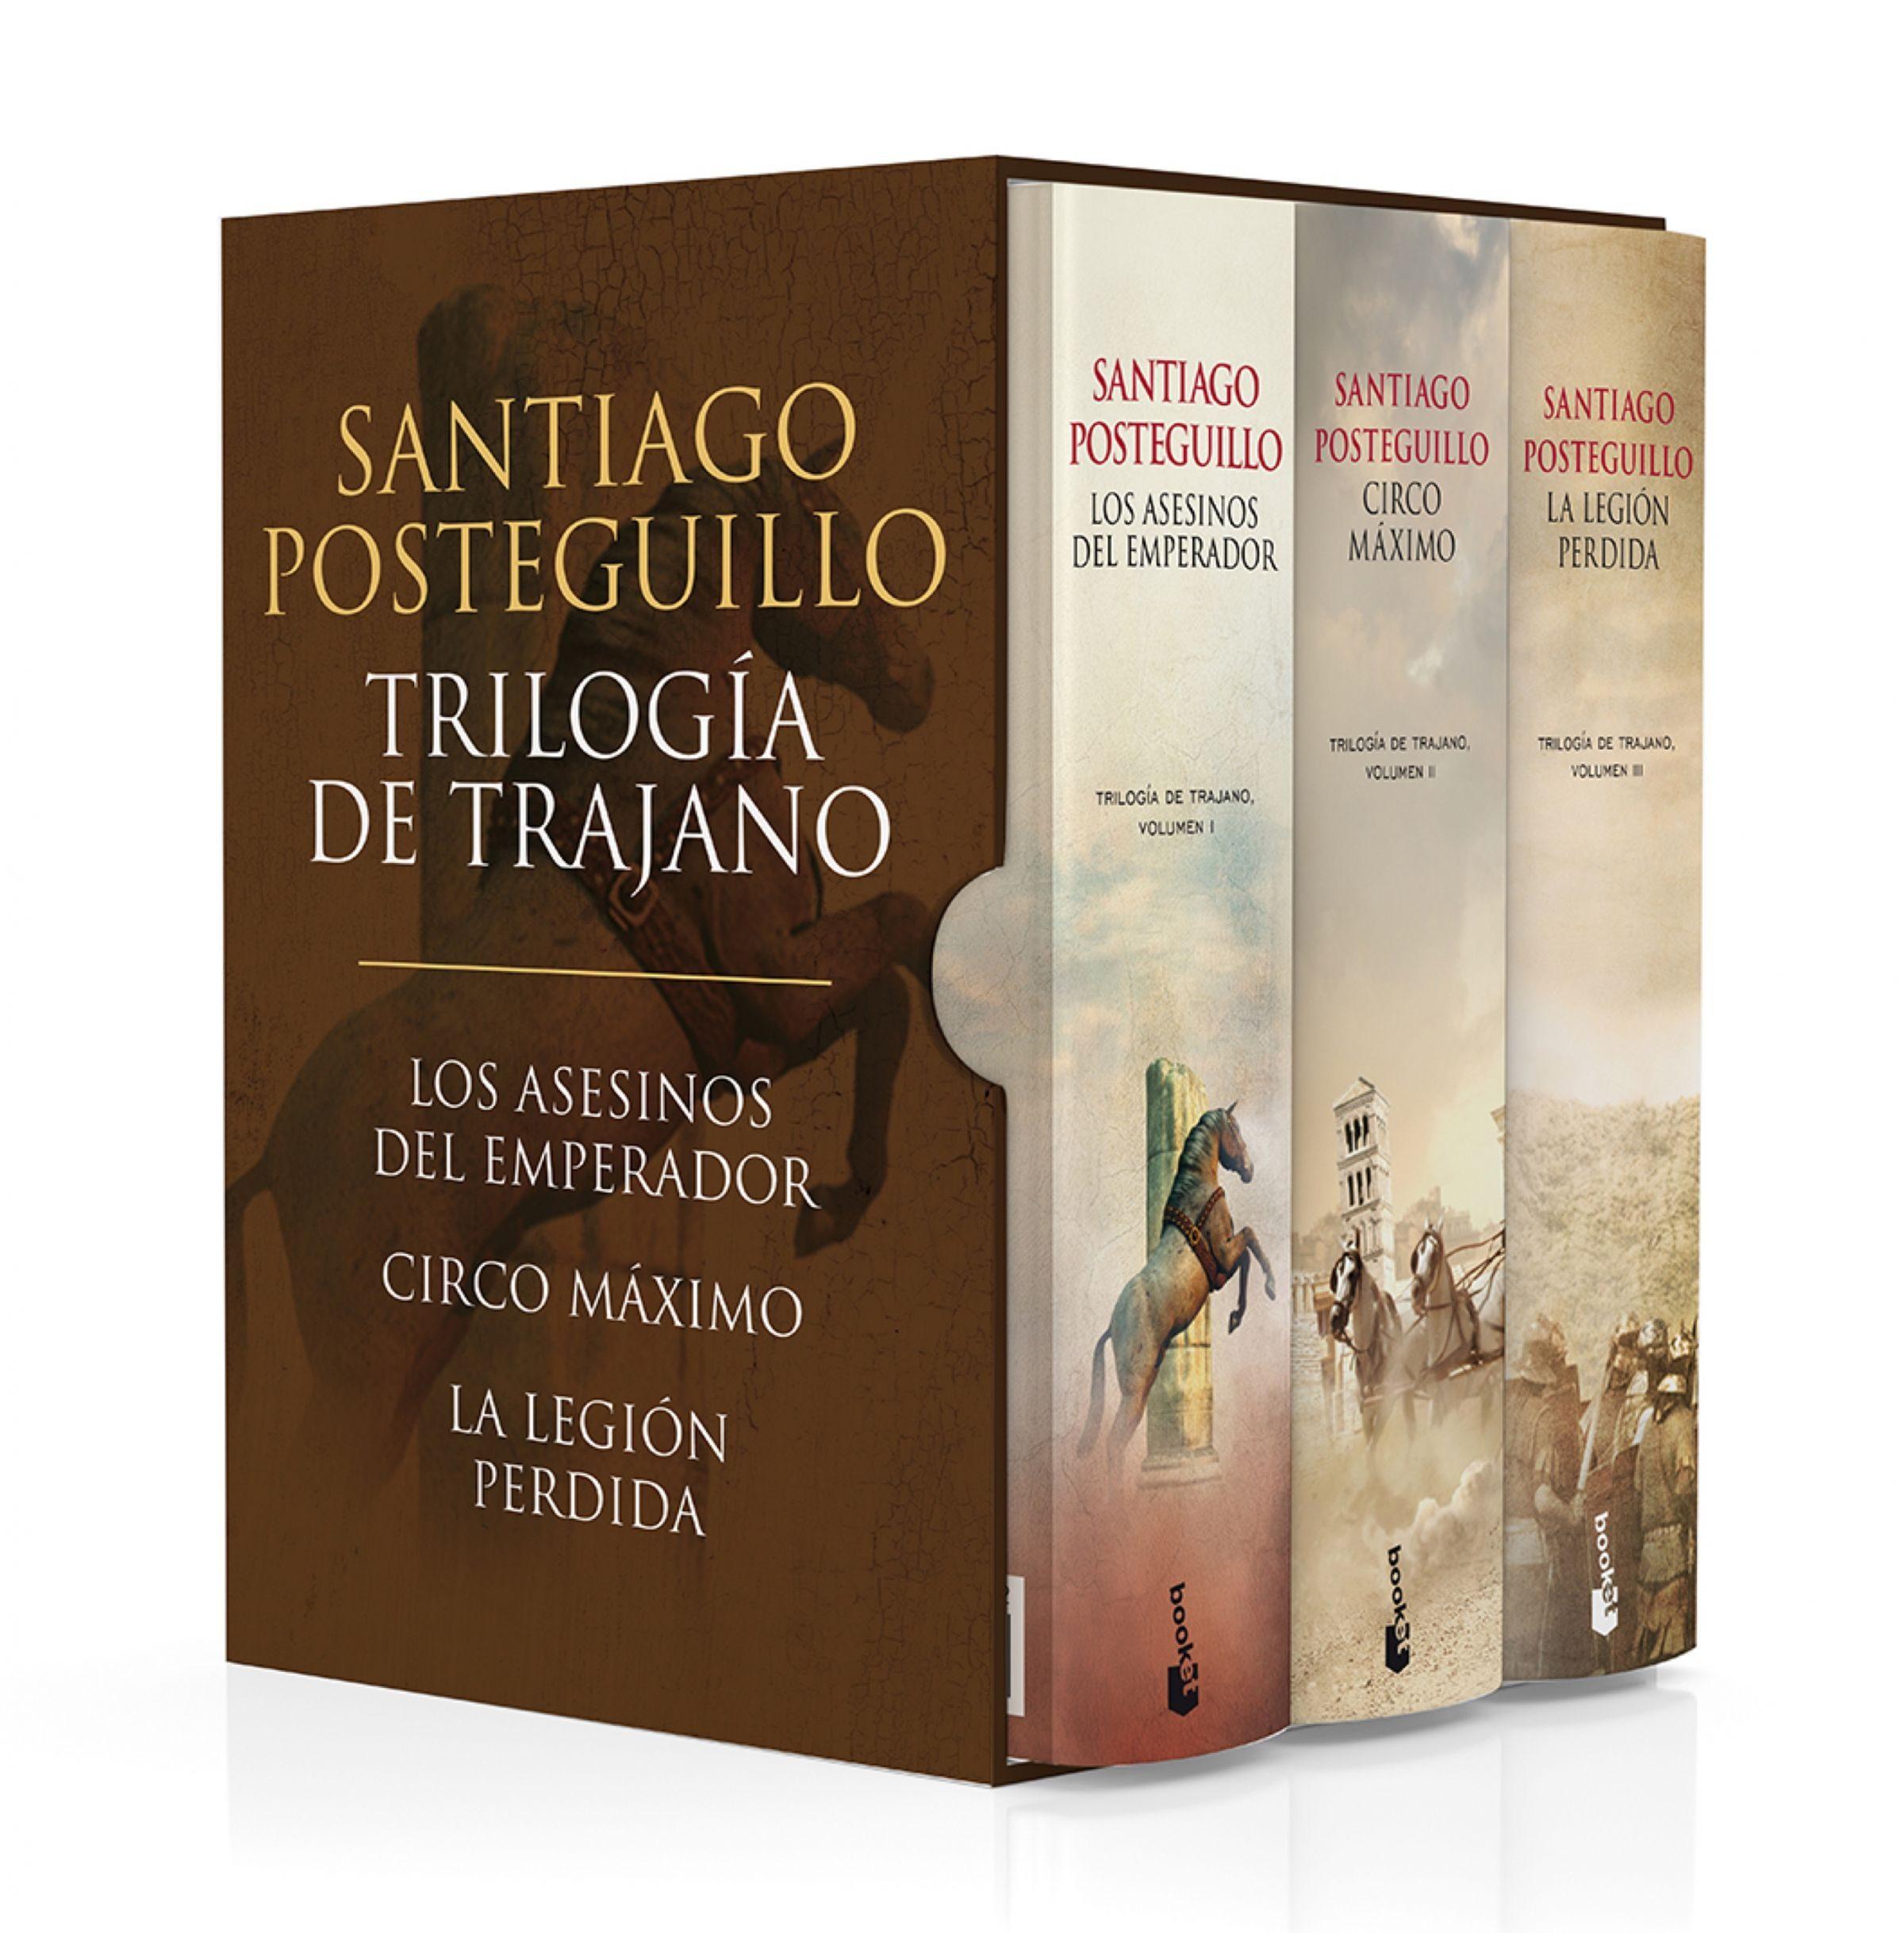 Estuche Trilogía de Trajano - Santiago Posteguillo - Planeta